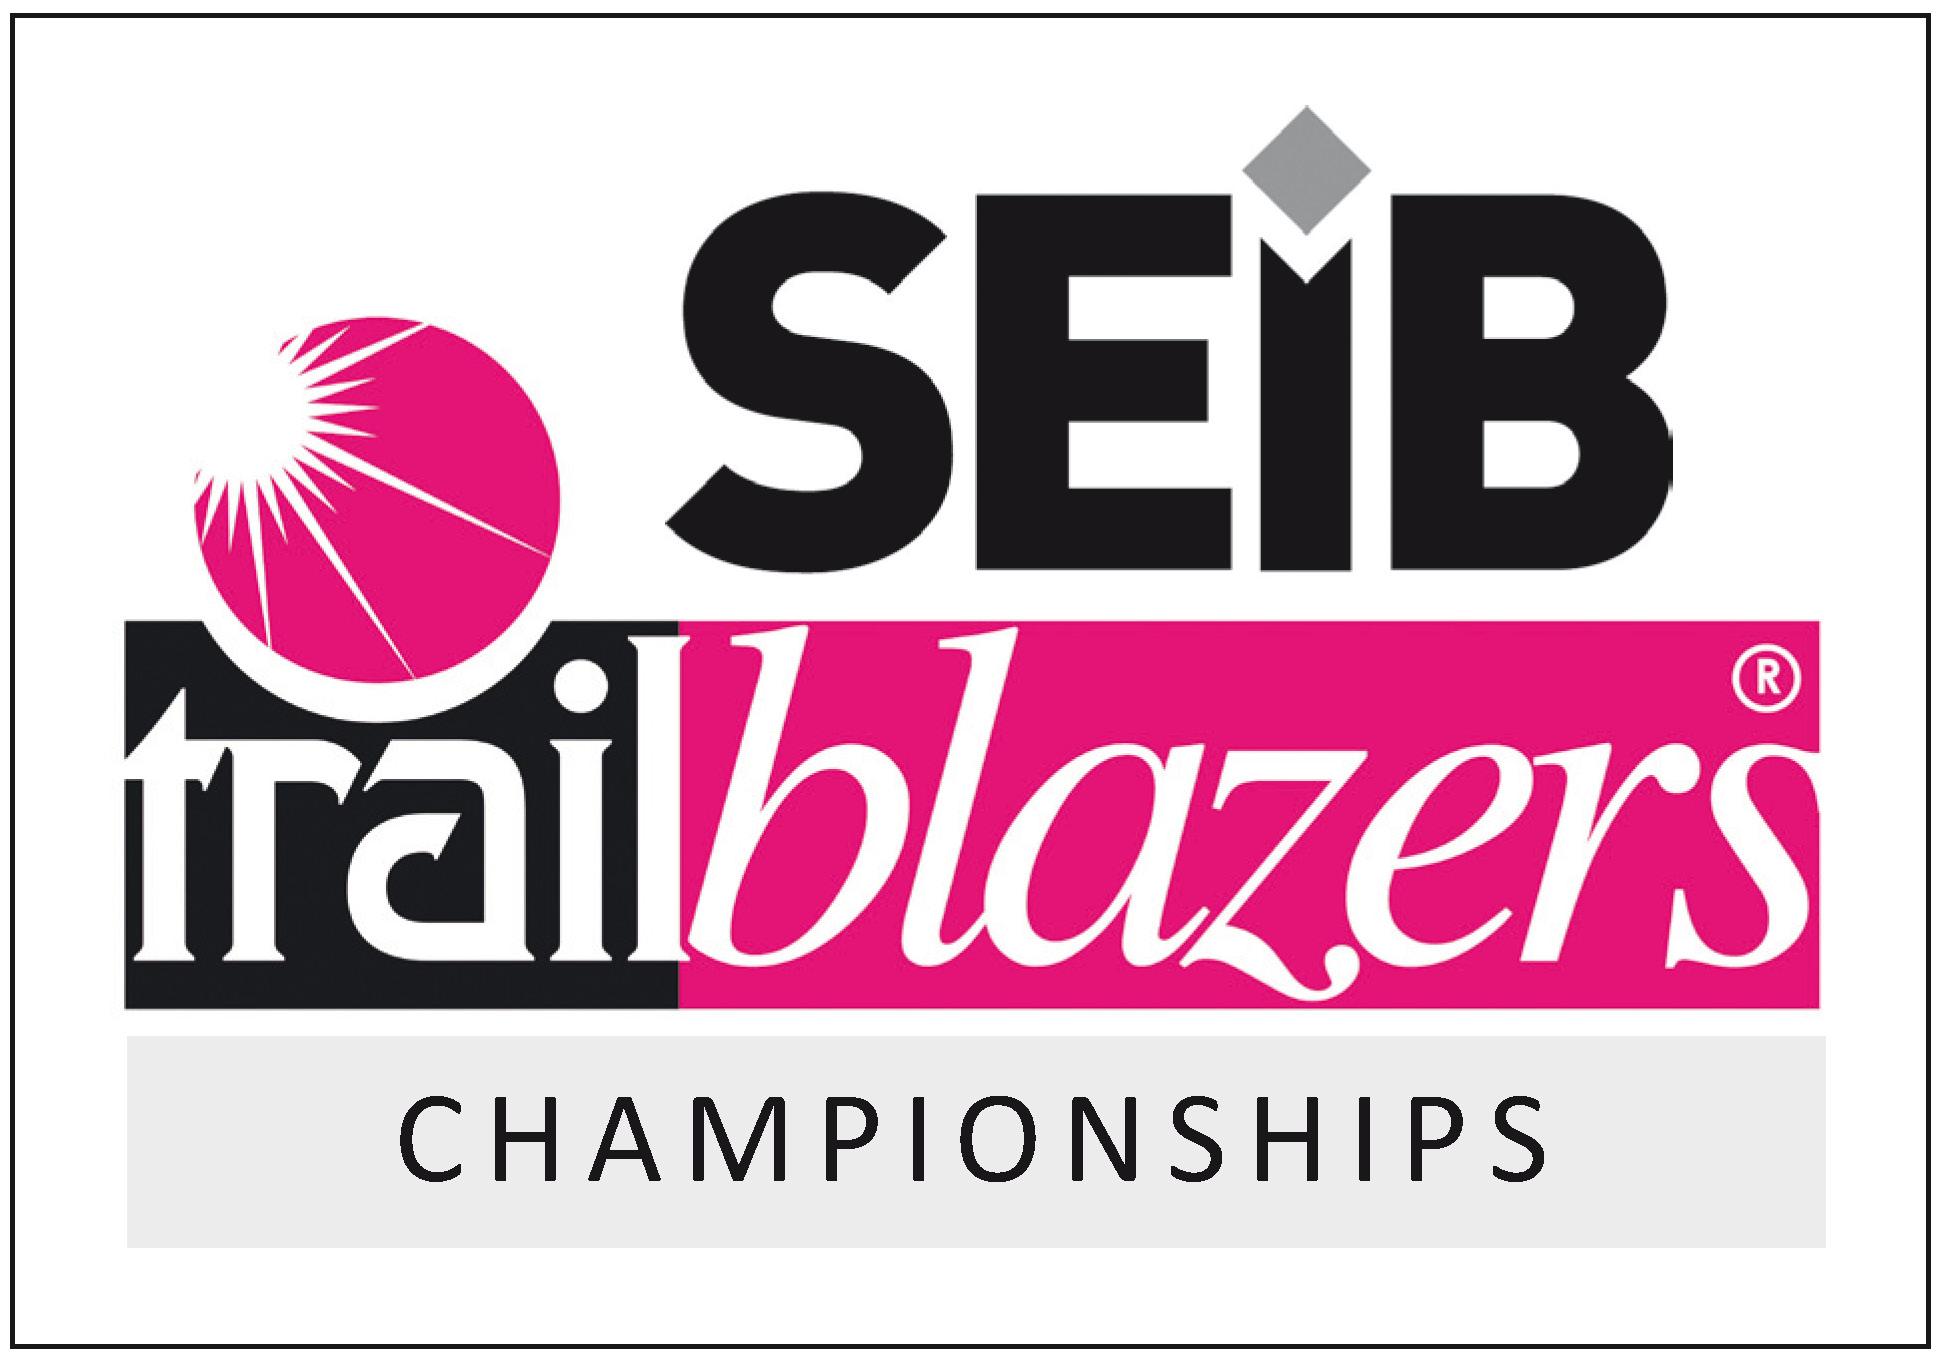 DATES FOR SEIB TRAILBLAZERS CHAMPIONSHIPS 2020